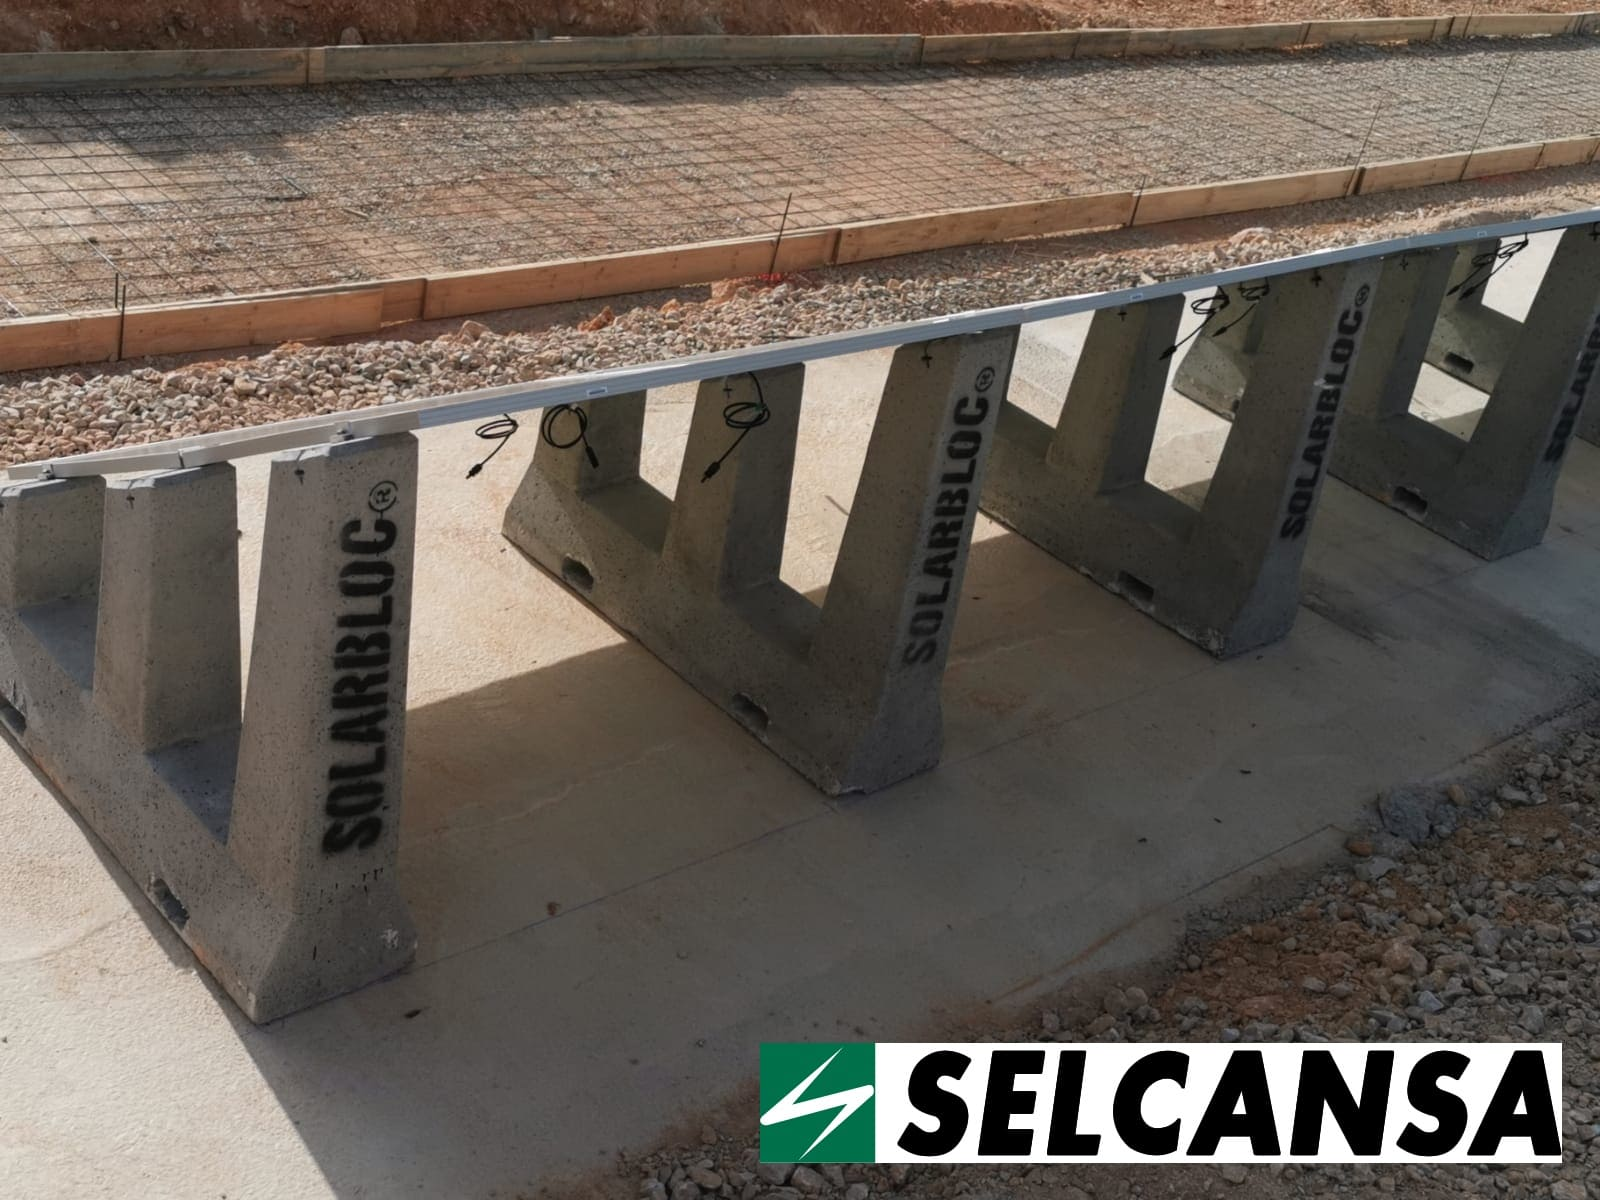 estructura soporte paneles solares SOLARBLOC SELCANSA